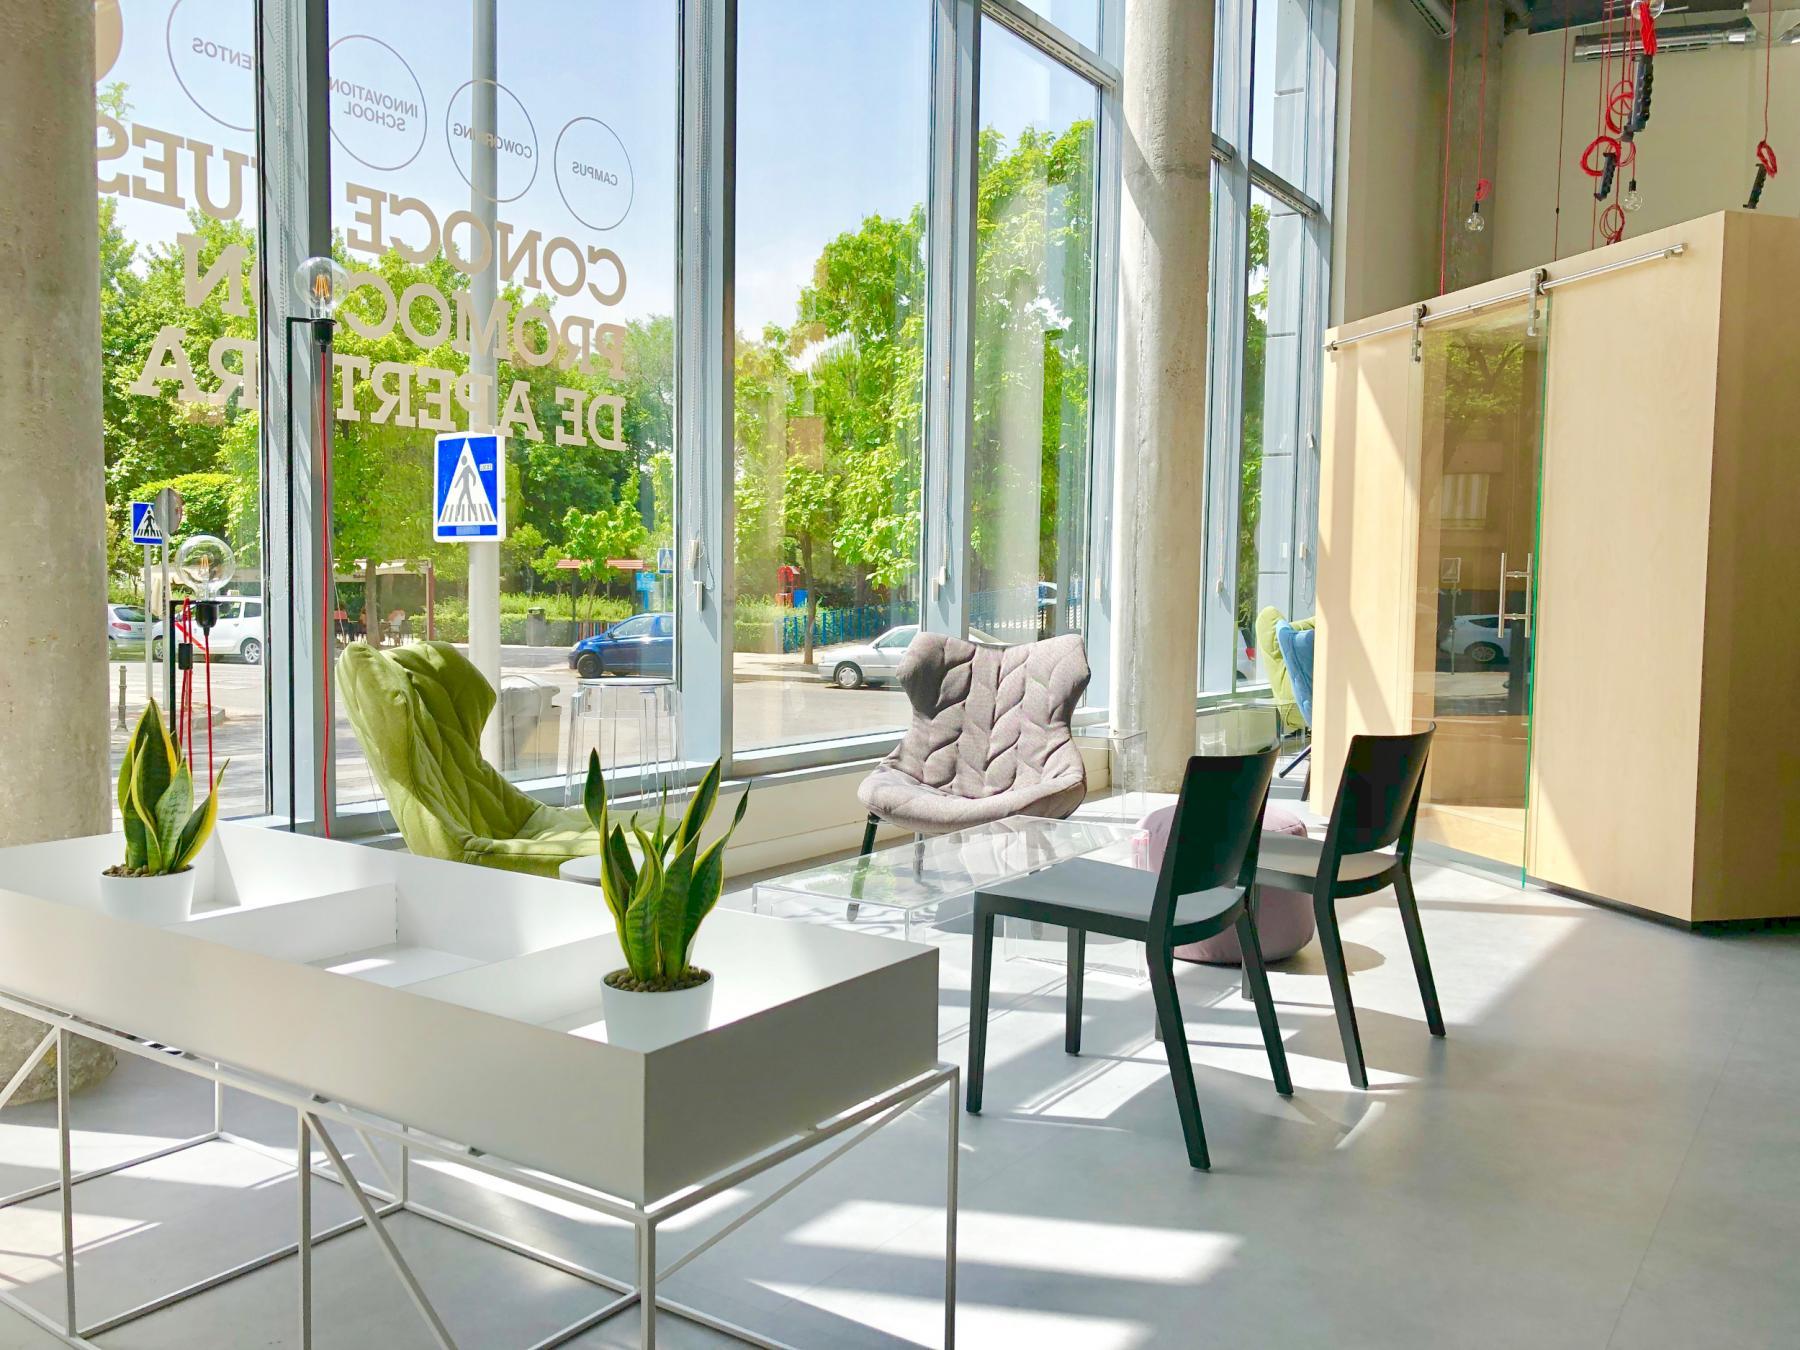 Alquilar oficinas Calle de Juan de Mariana 15, Madrid (6)